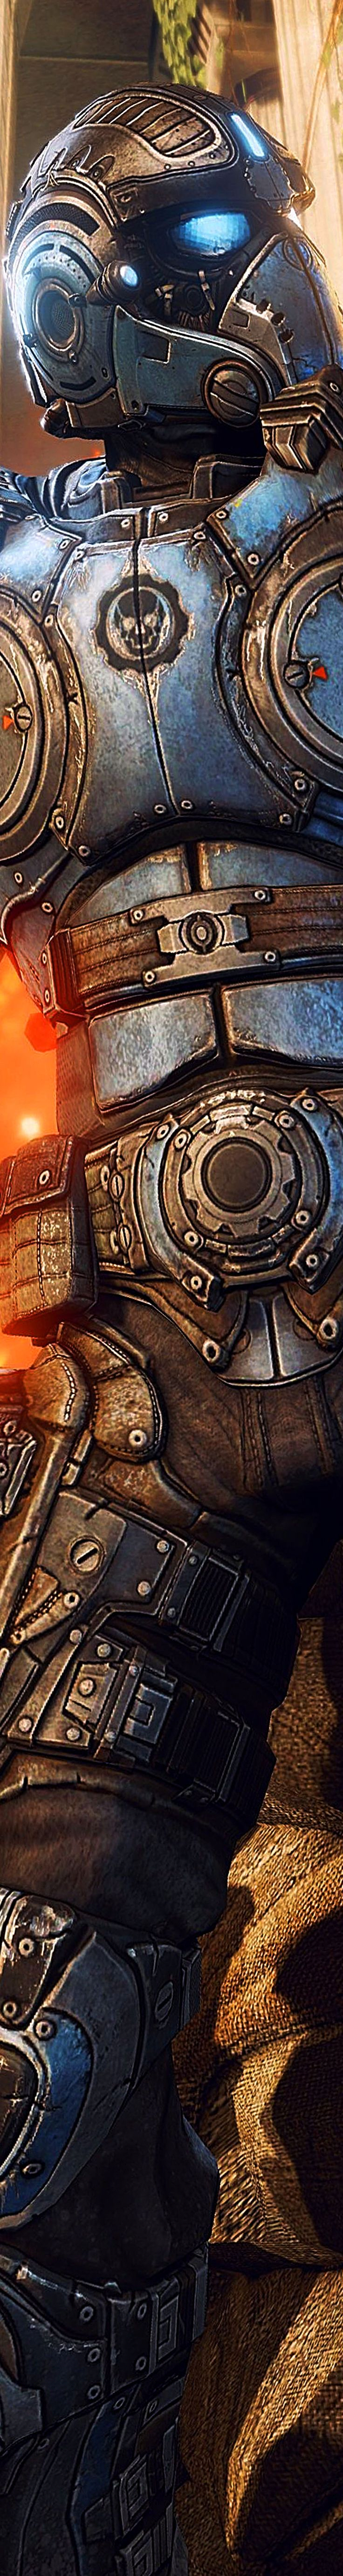 Gears of War 3 ❤️